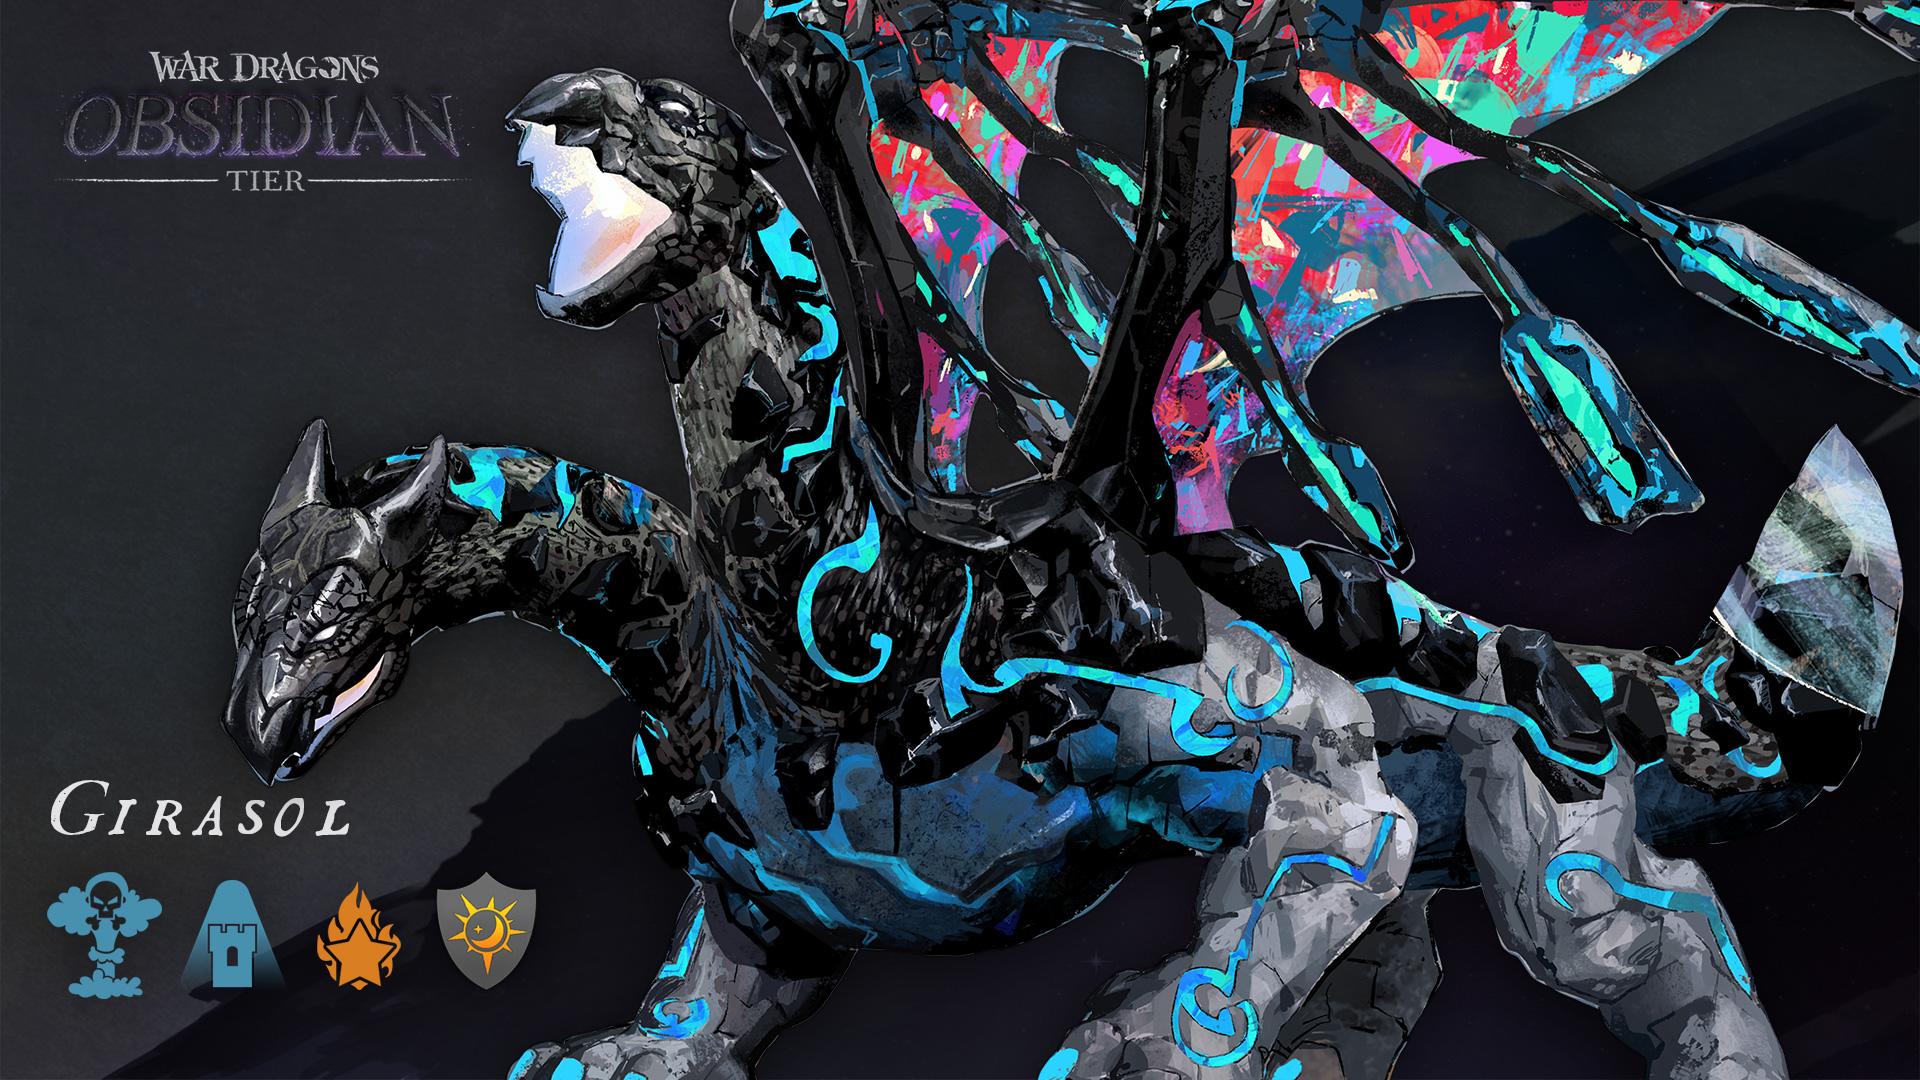 War Dragons - Girasol